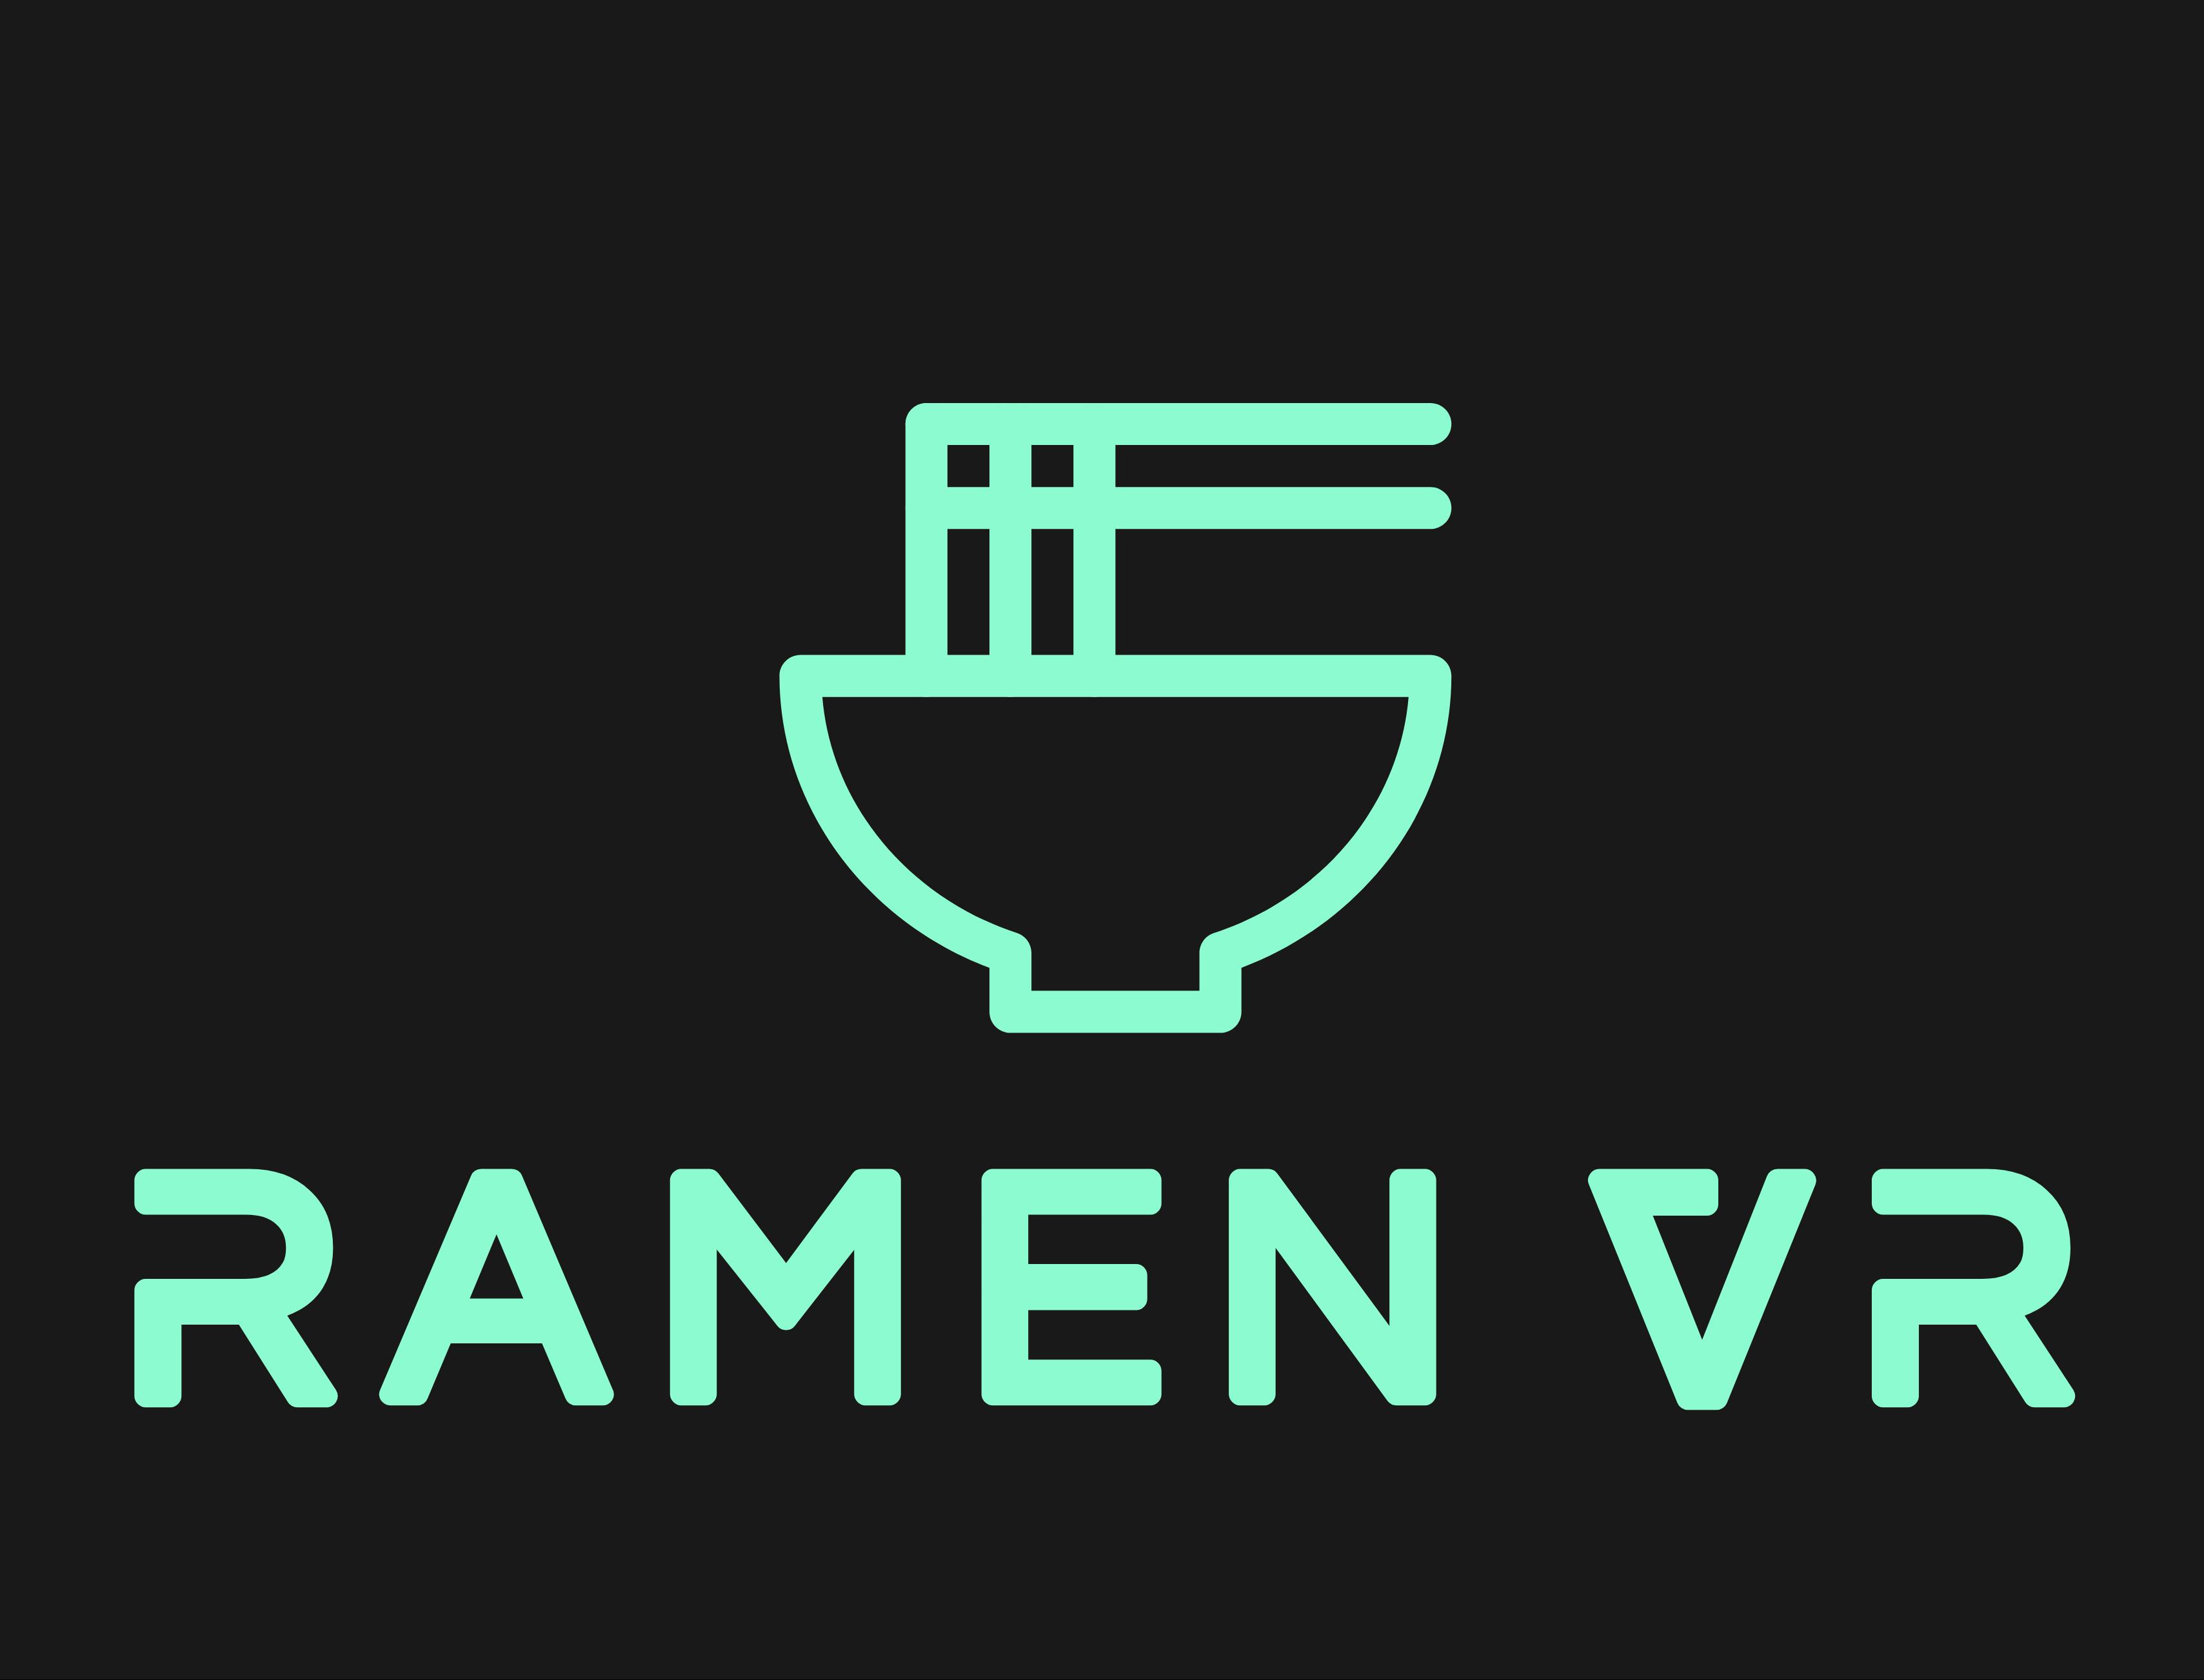 Ramen VR logo